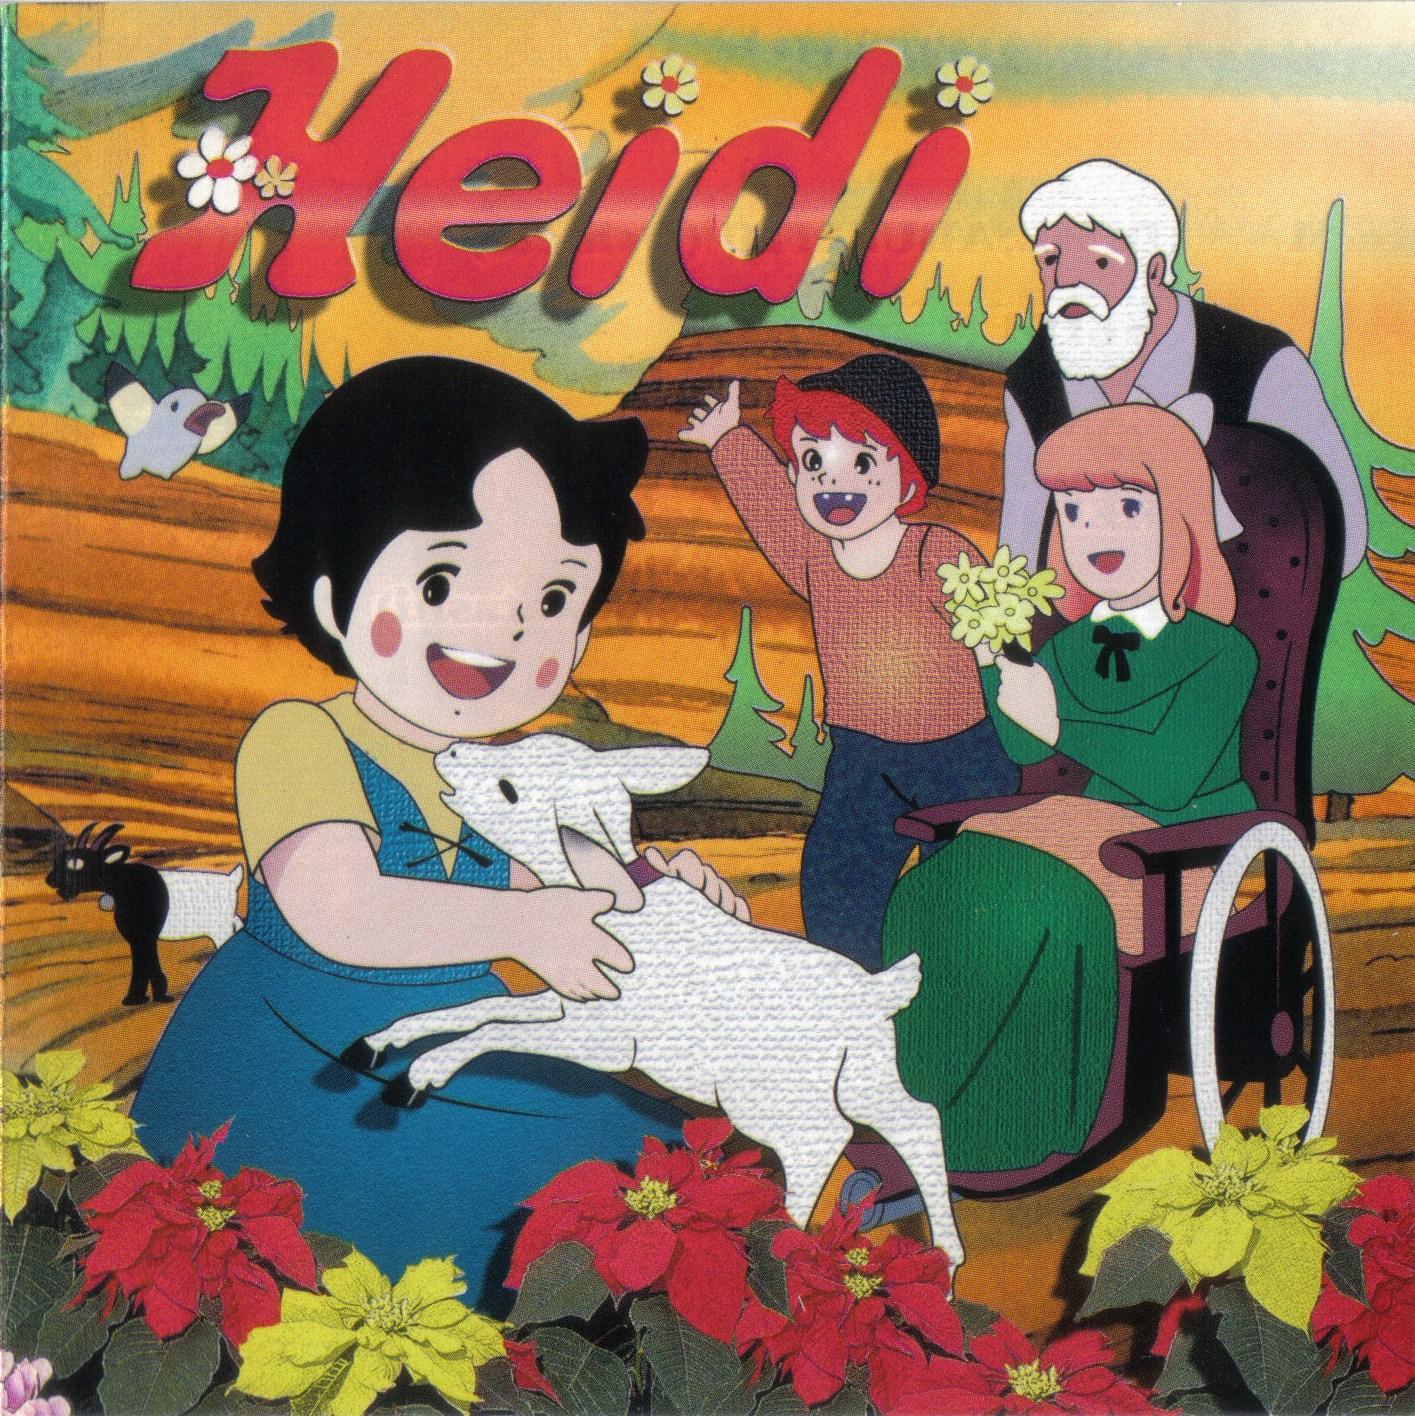 Heidi 1974